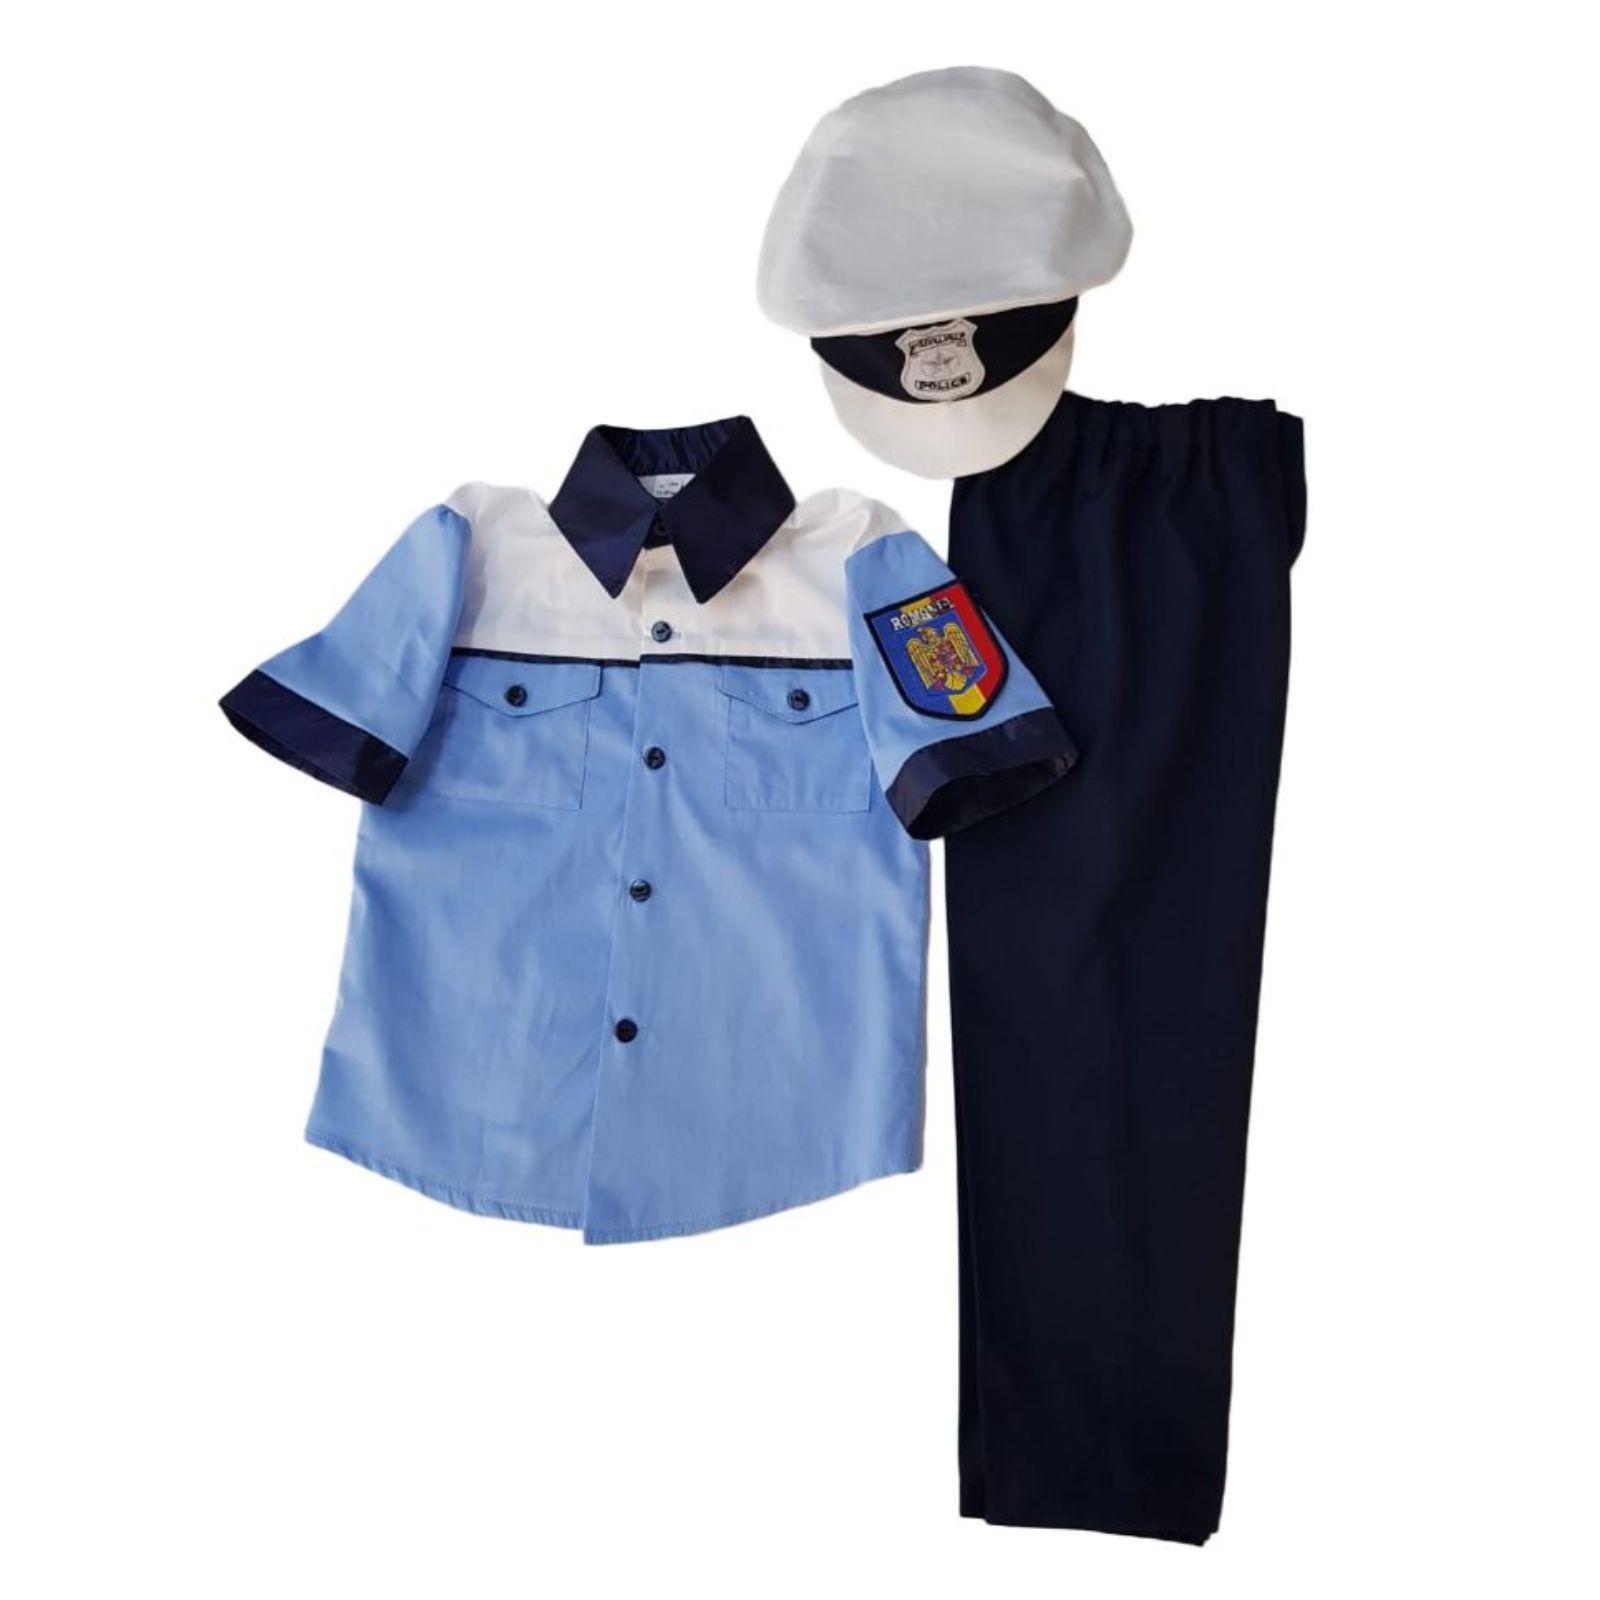 Costum politist copii- sapca bicolora și scris reflectorizant